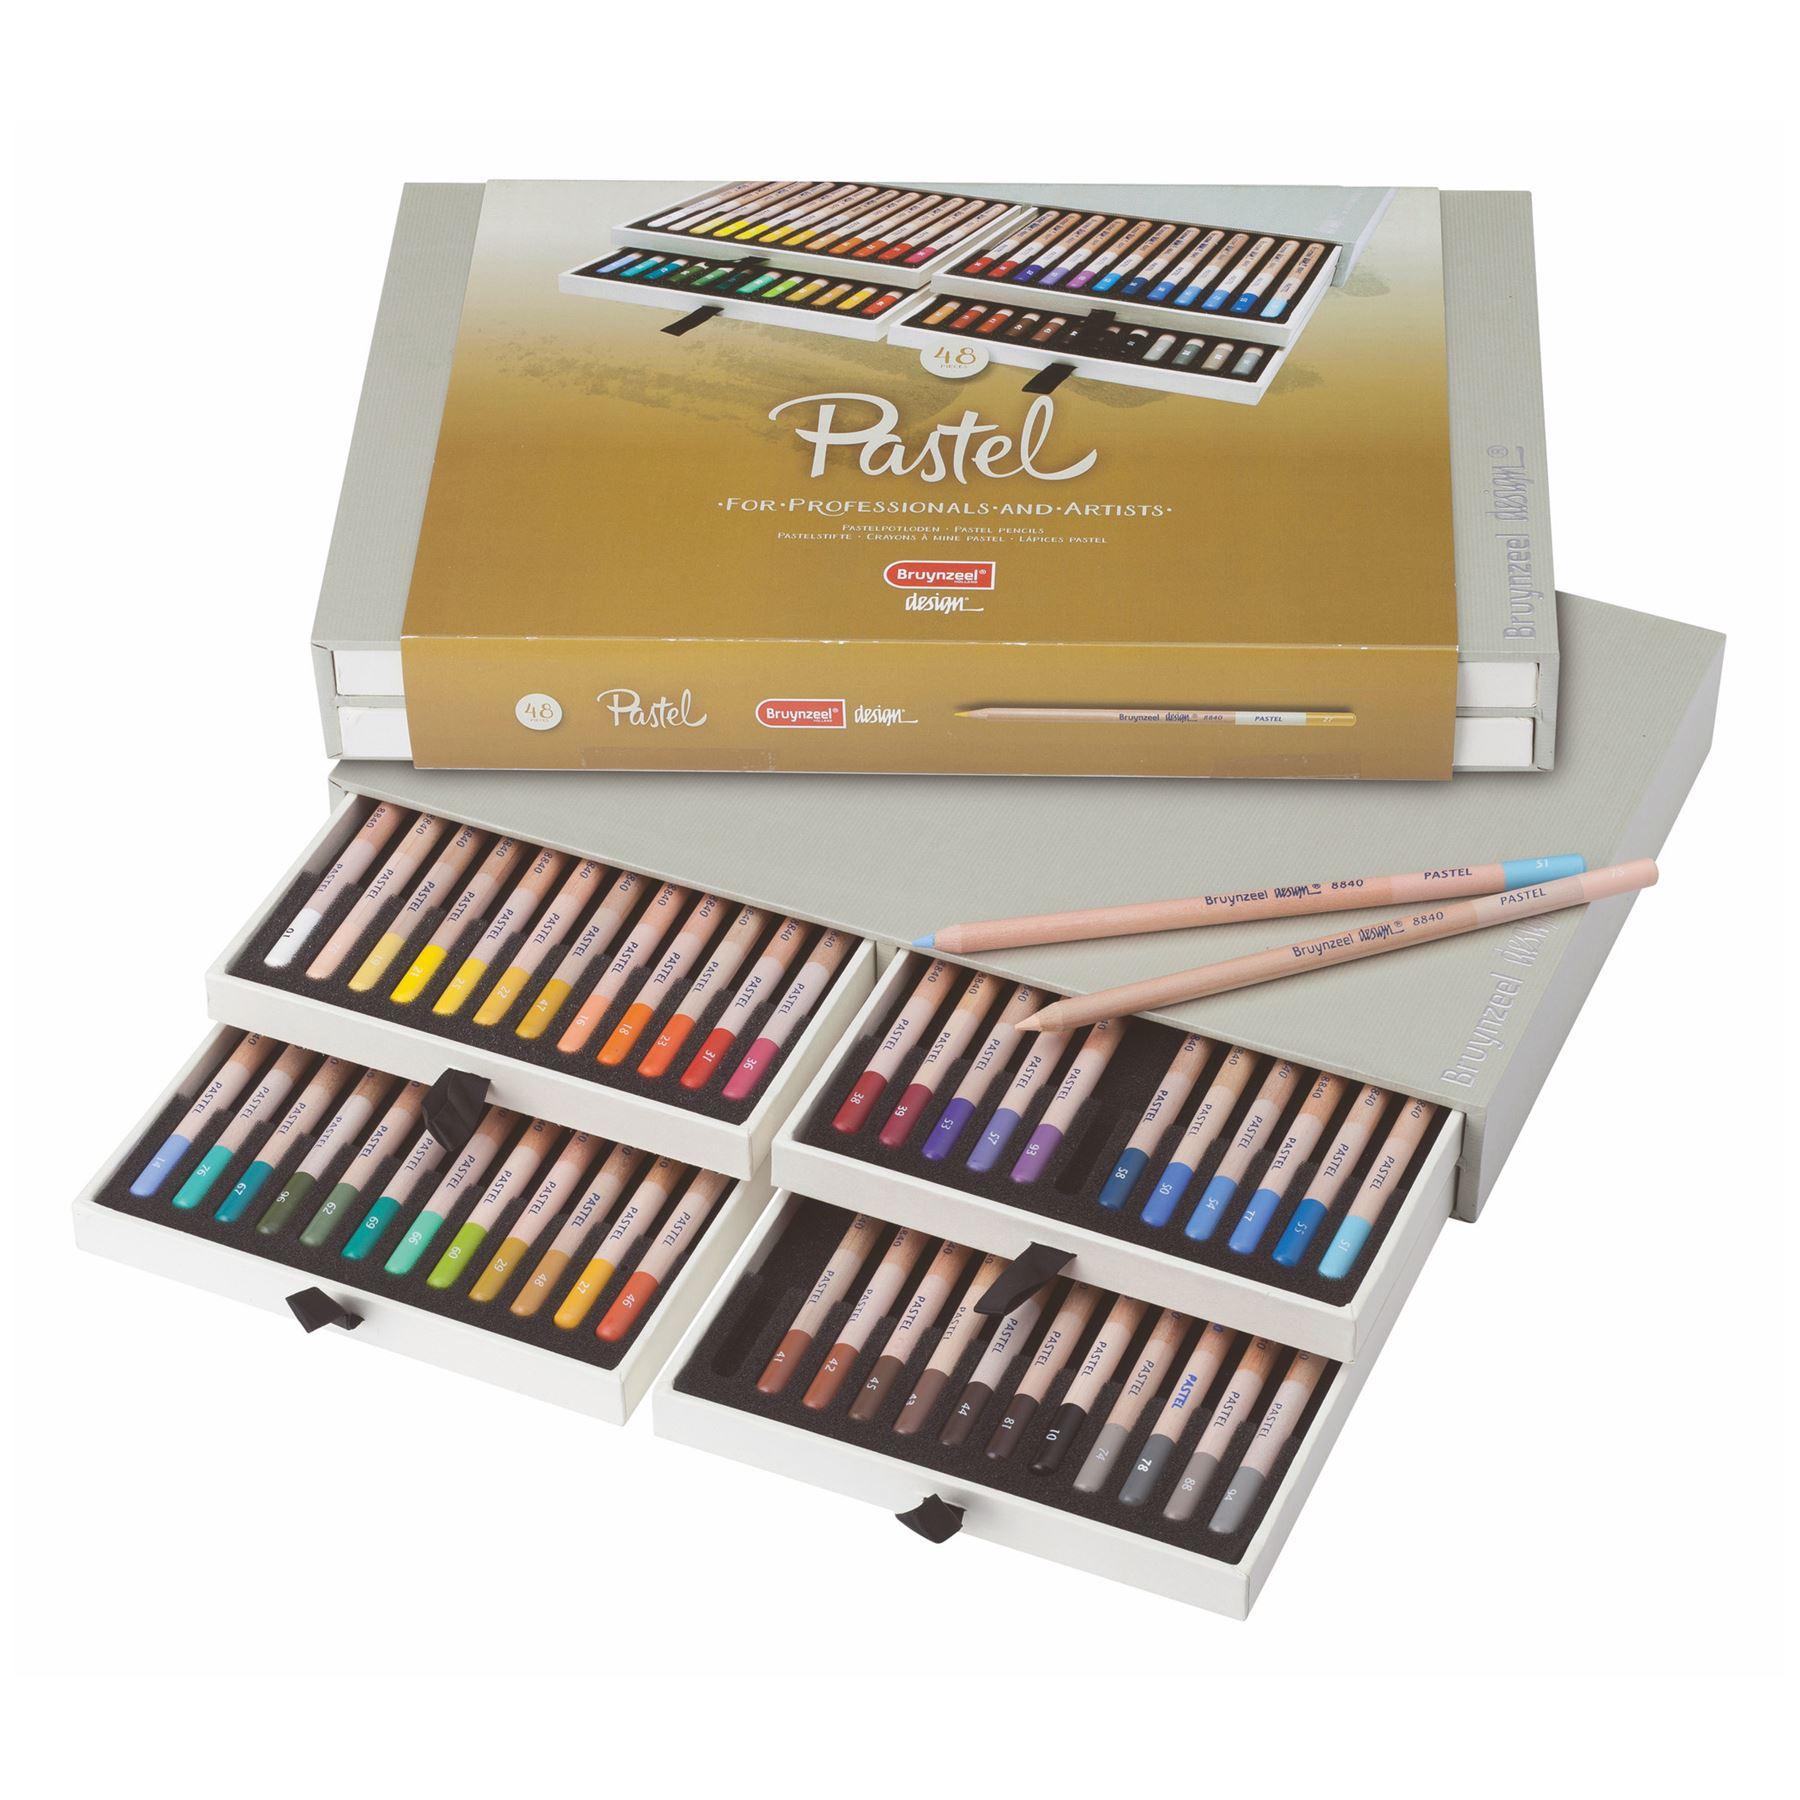 Ebay Uk: Artists Pastel Pencils Bruynzeel Professional Soft Pencil